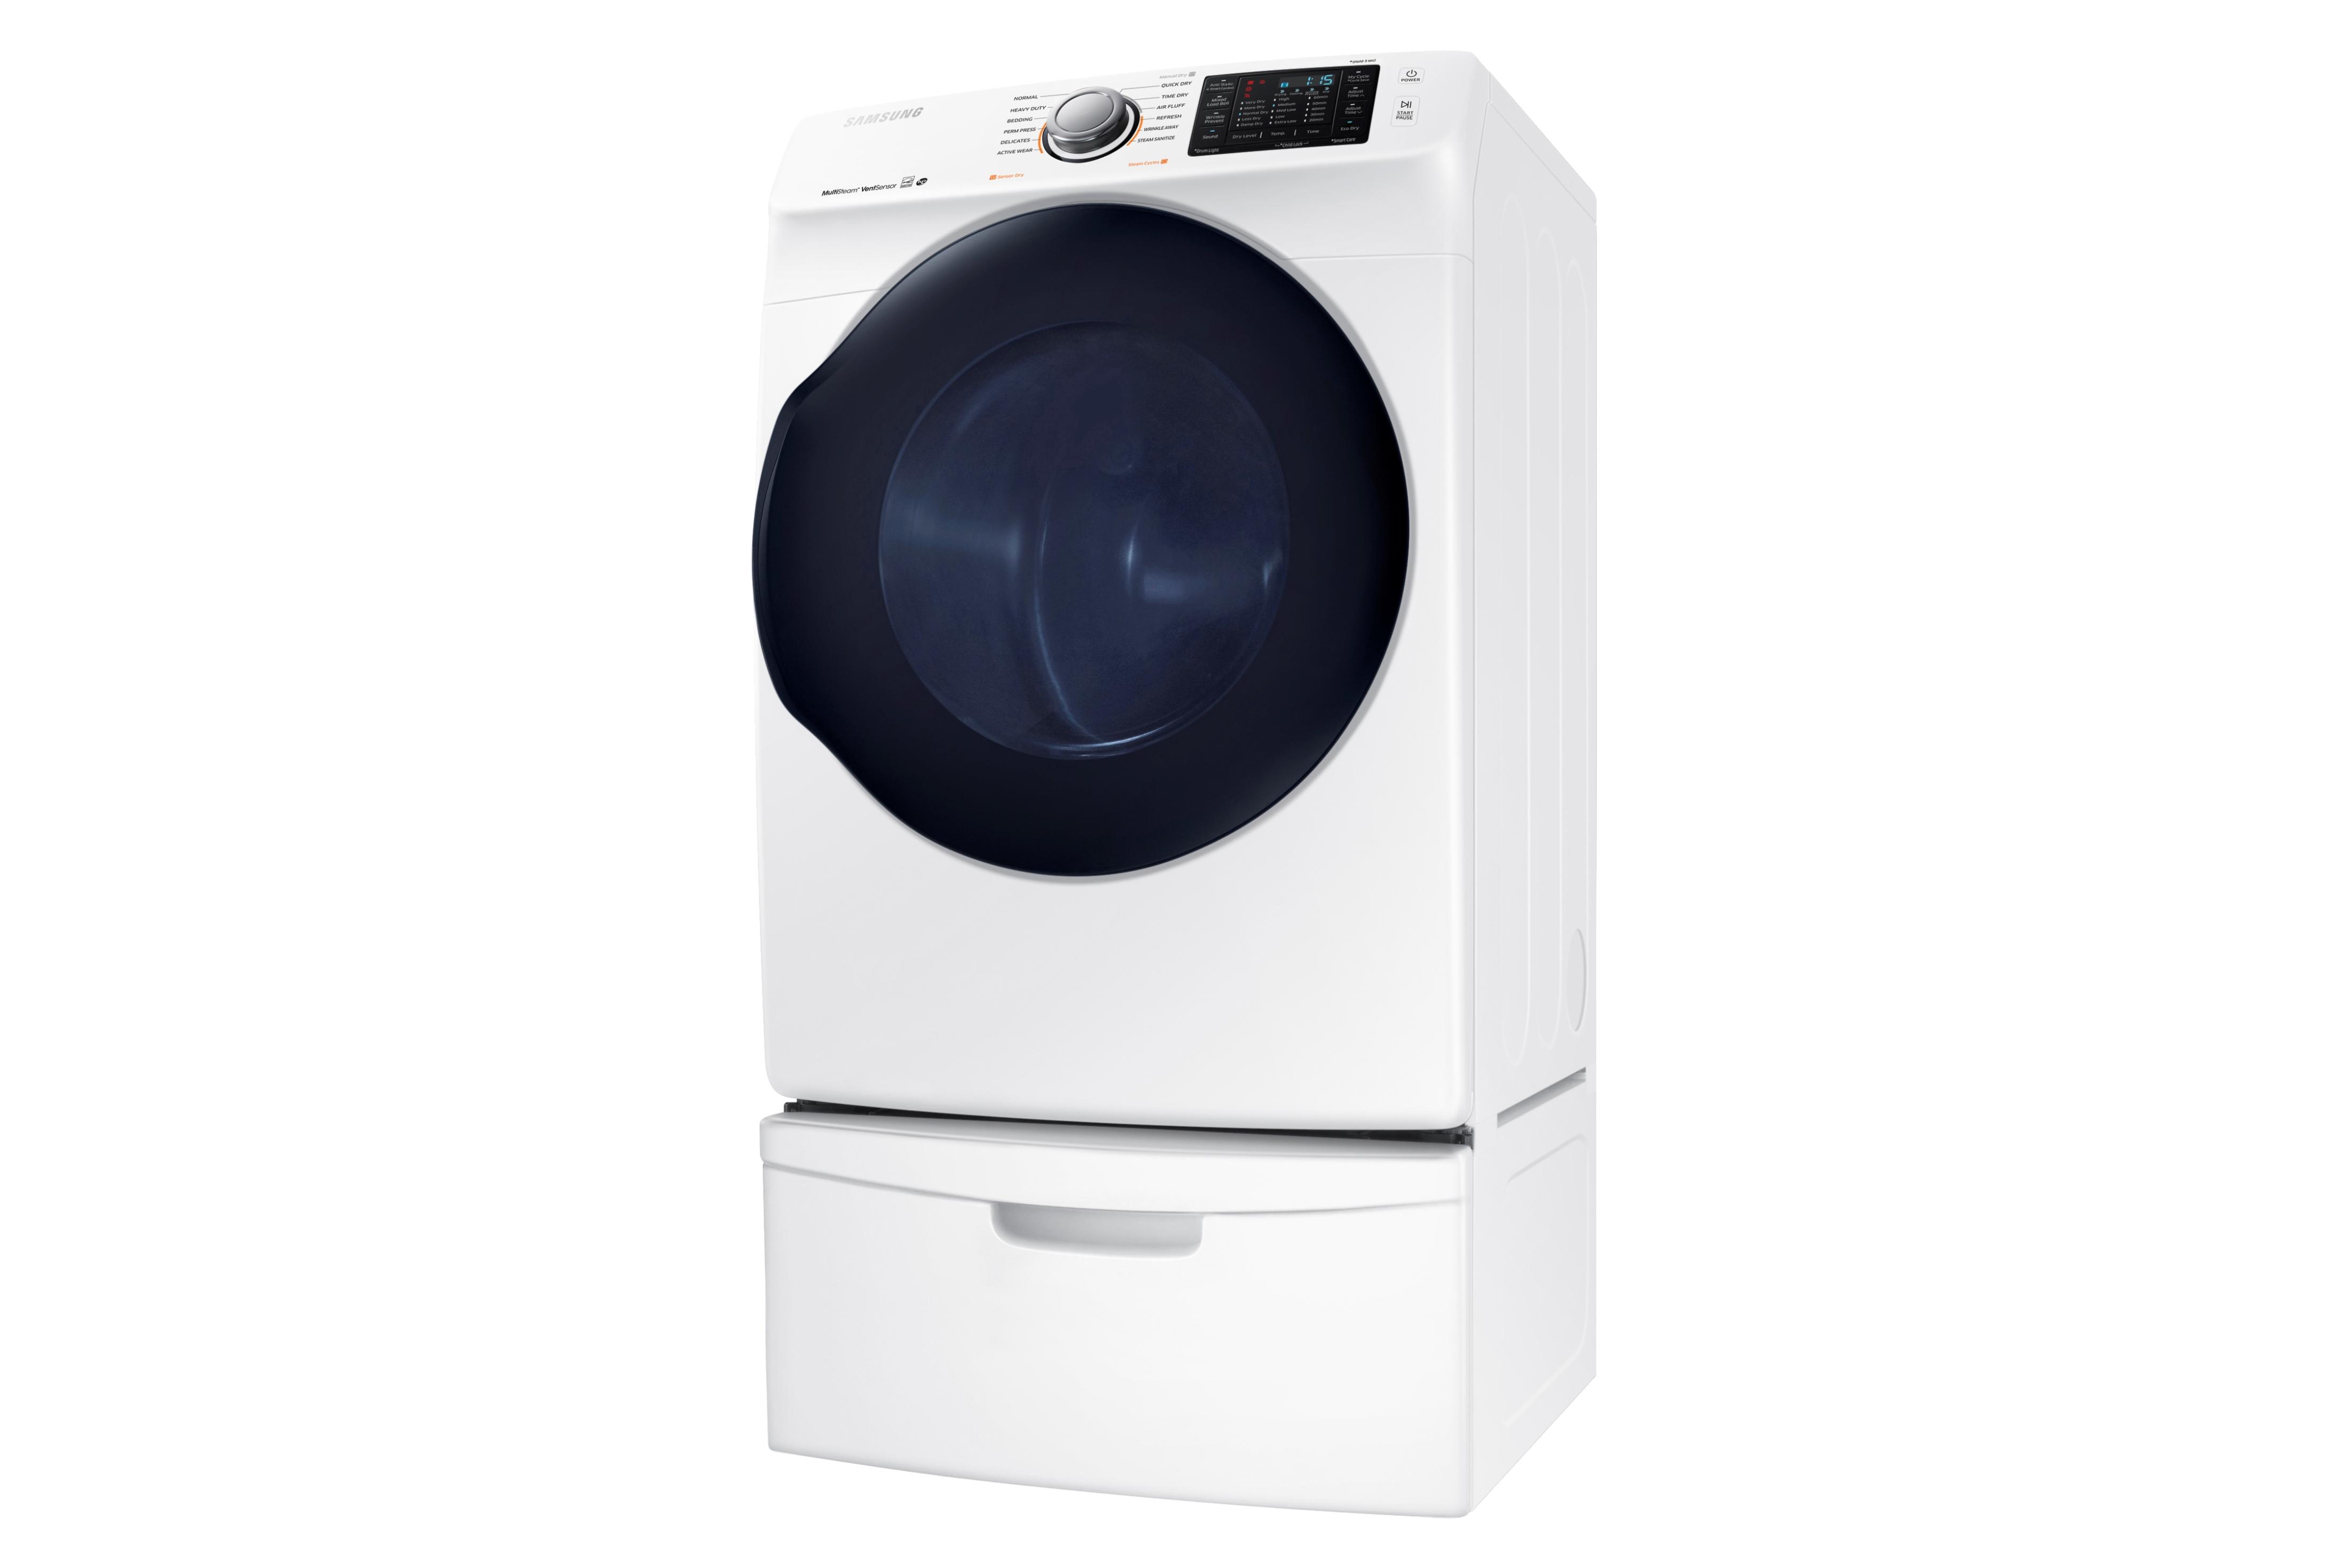 Samsung DV45K6200EW 7.5 cu. ft. Capacity Electric Dryer (White)